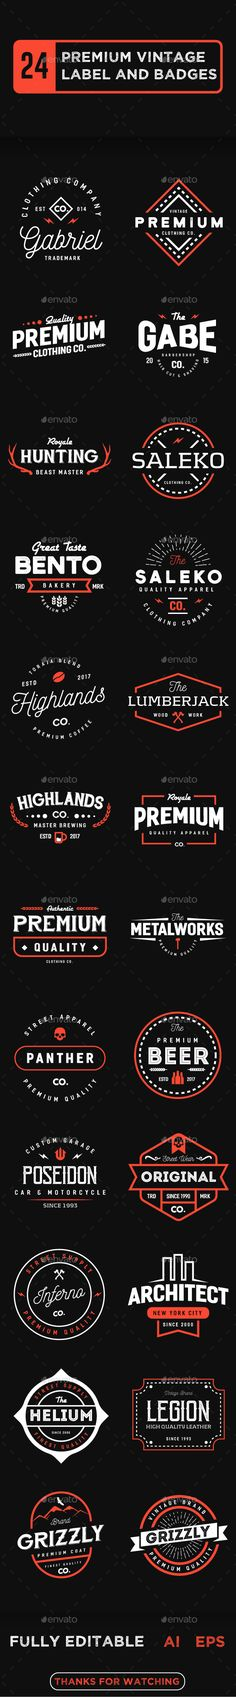 24 Premium Vintage Label and Badges Templates Vector EPS, AI Illustrator